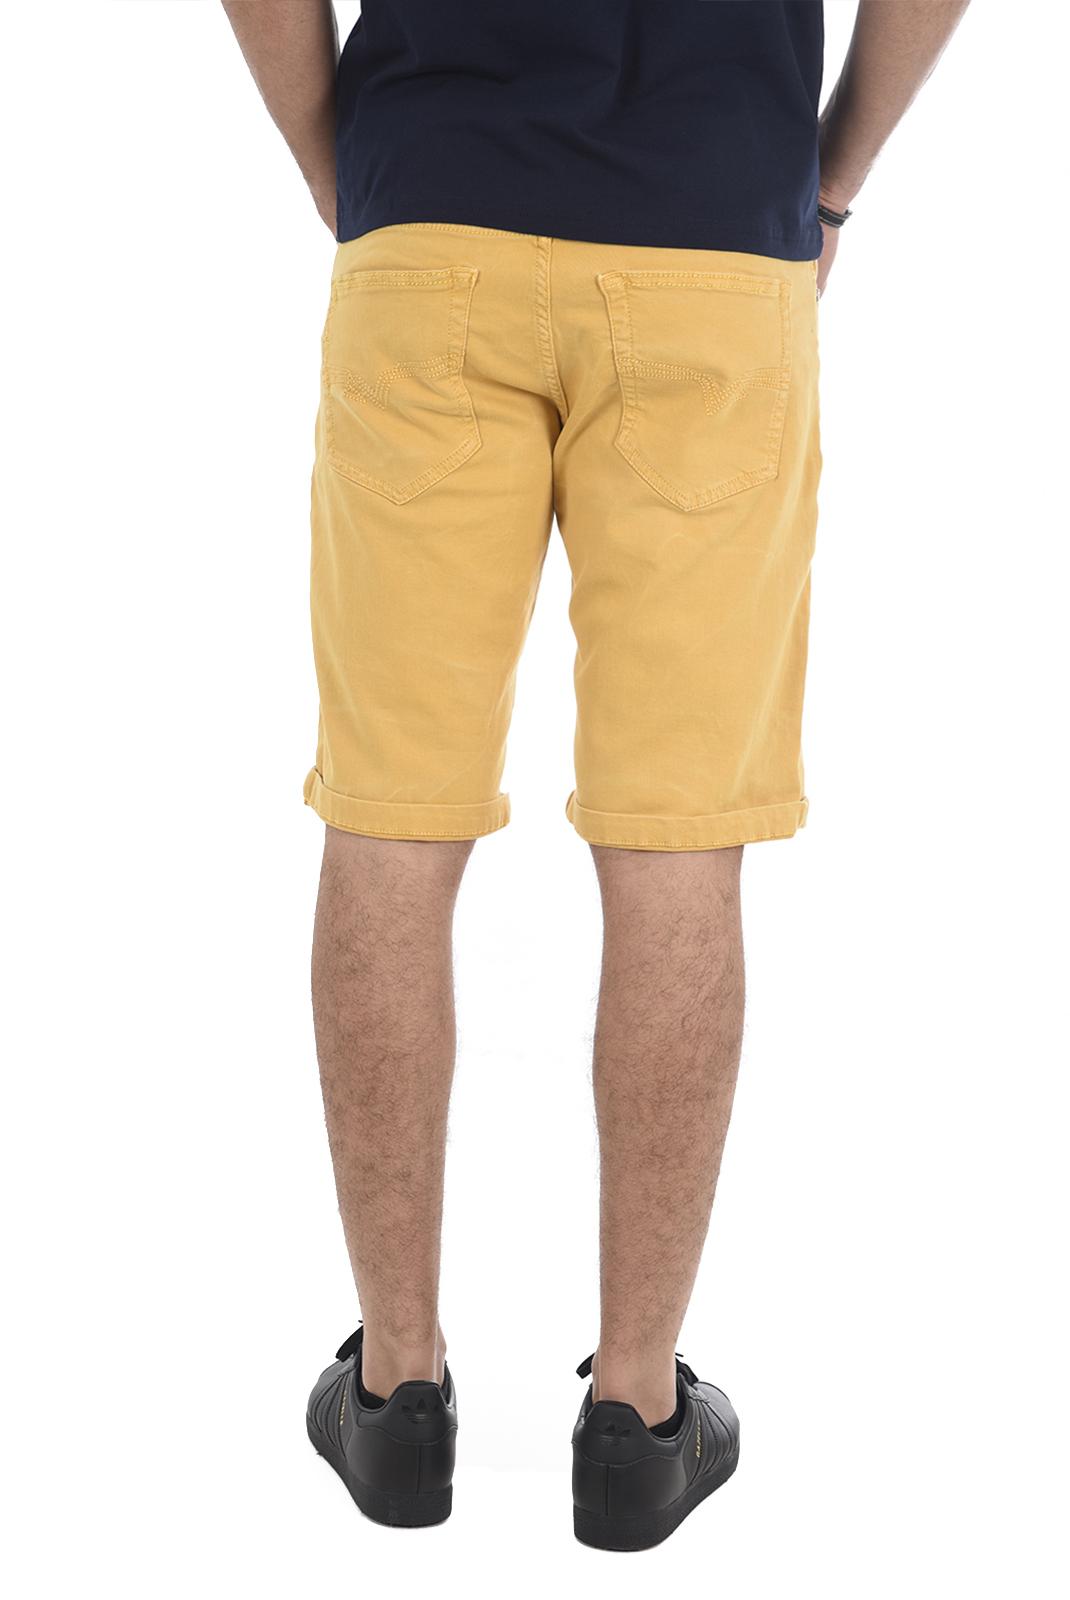 Shorts & Bermudas  Kaporal VITO SUNFLOWER